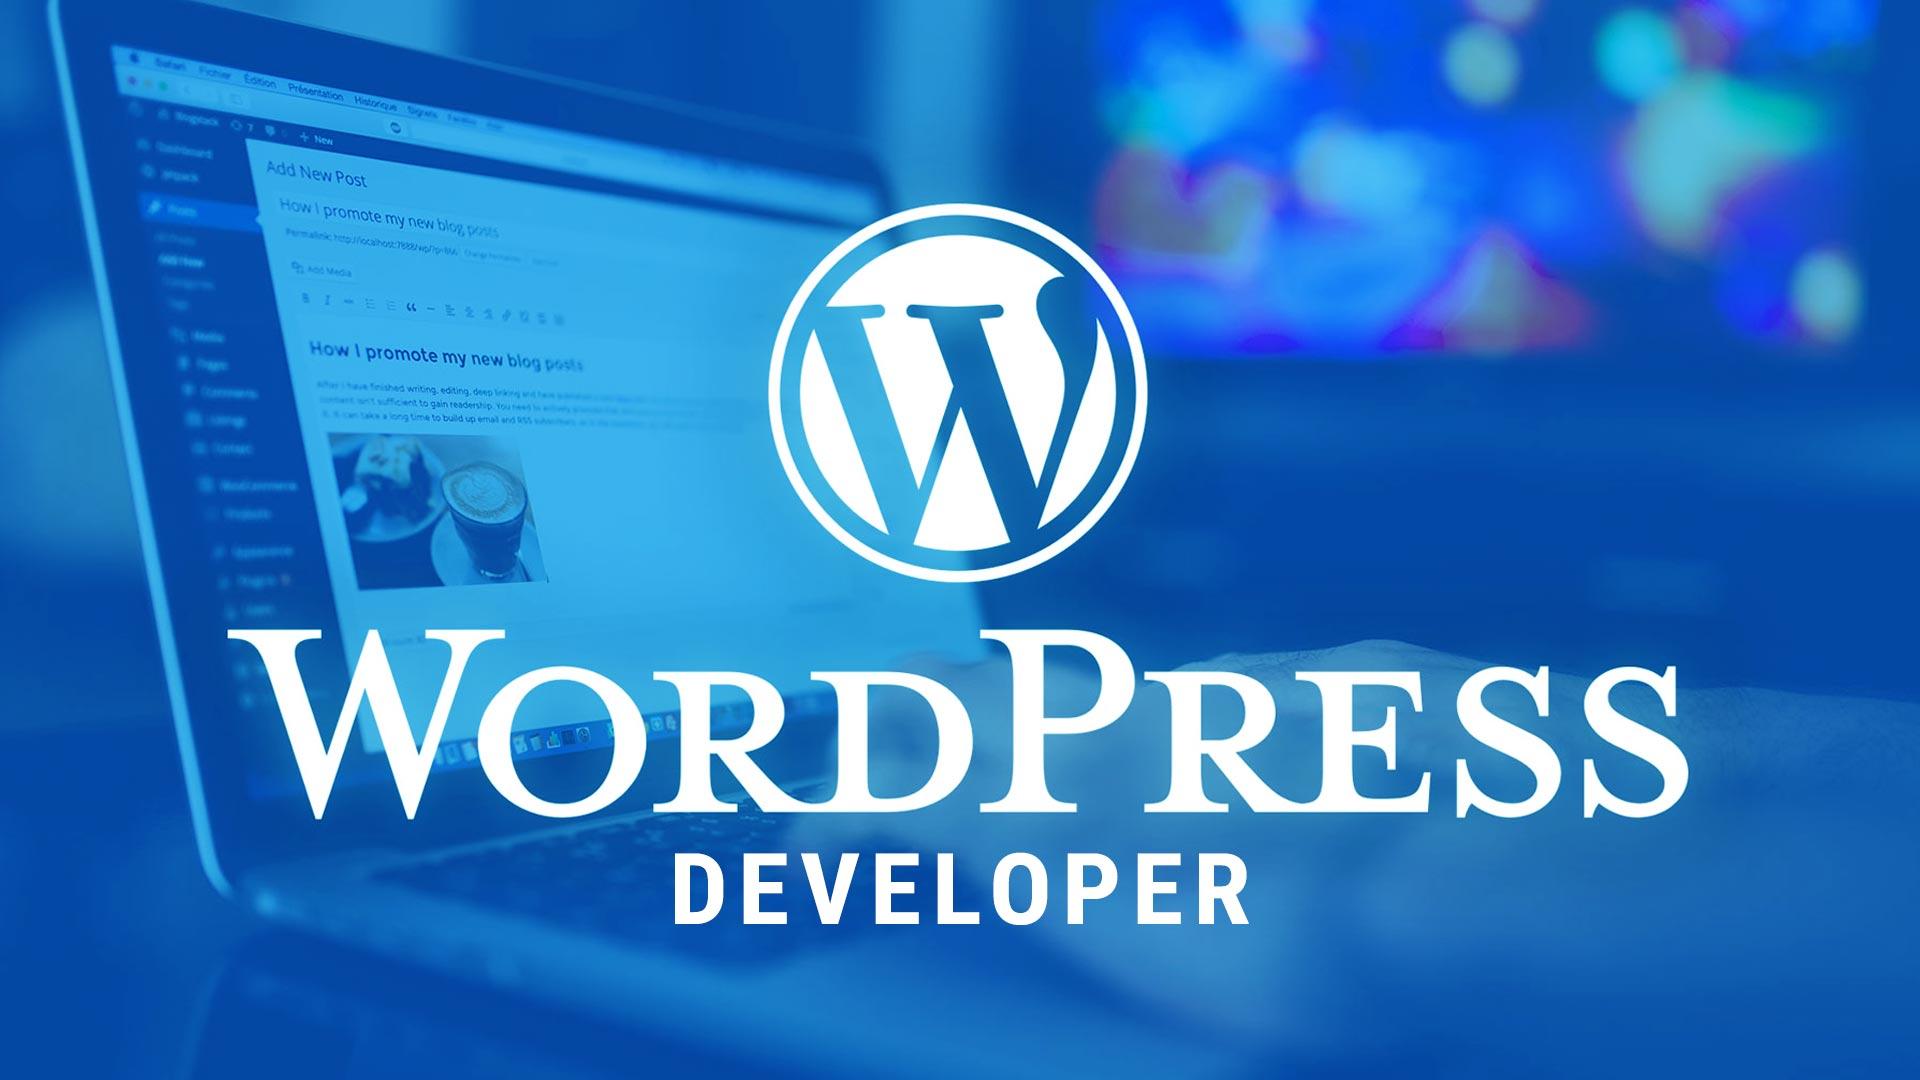 Mengenal WordPress Developer, Salah Satu Profesi yang Menjanjikan